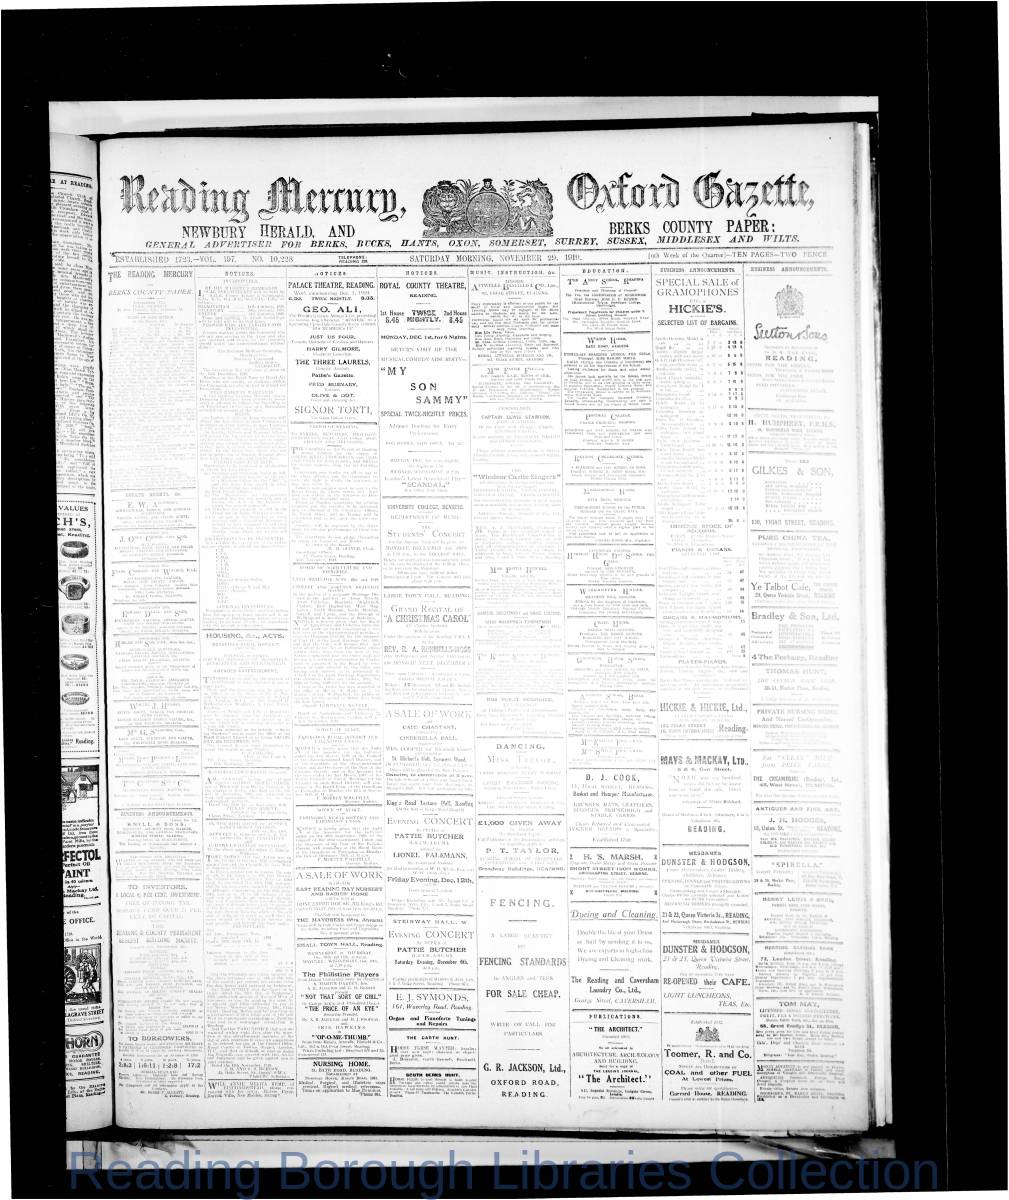 Reading Mercury Oxford Gazette  Saturday, November 29, 1919. Pg 1